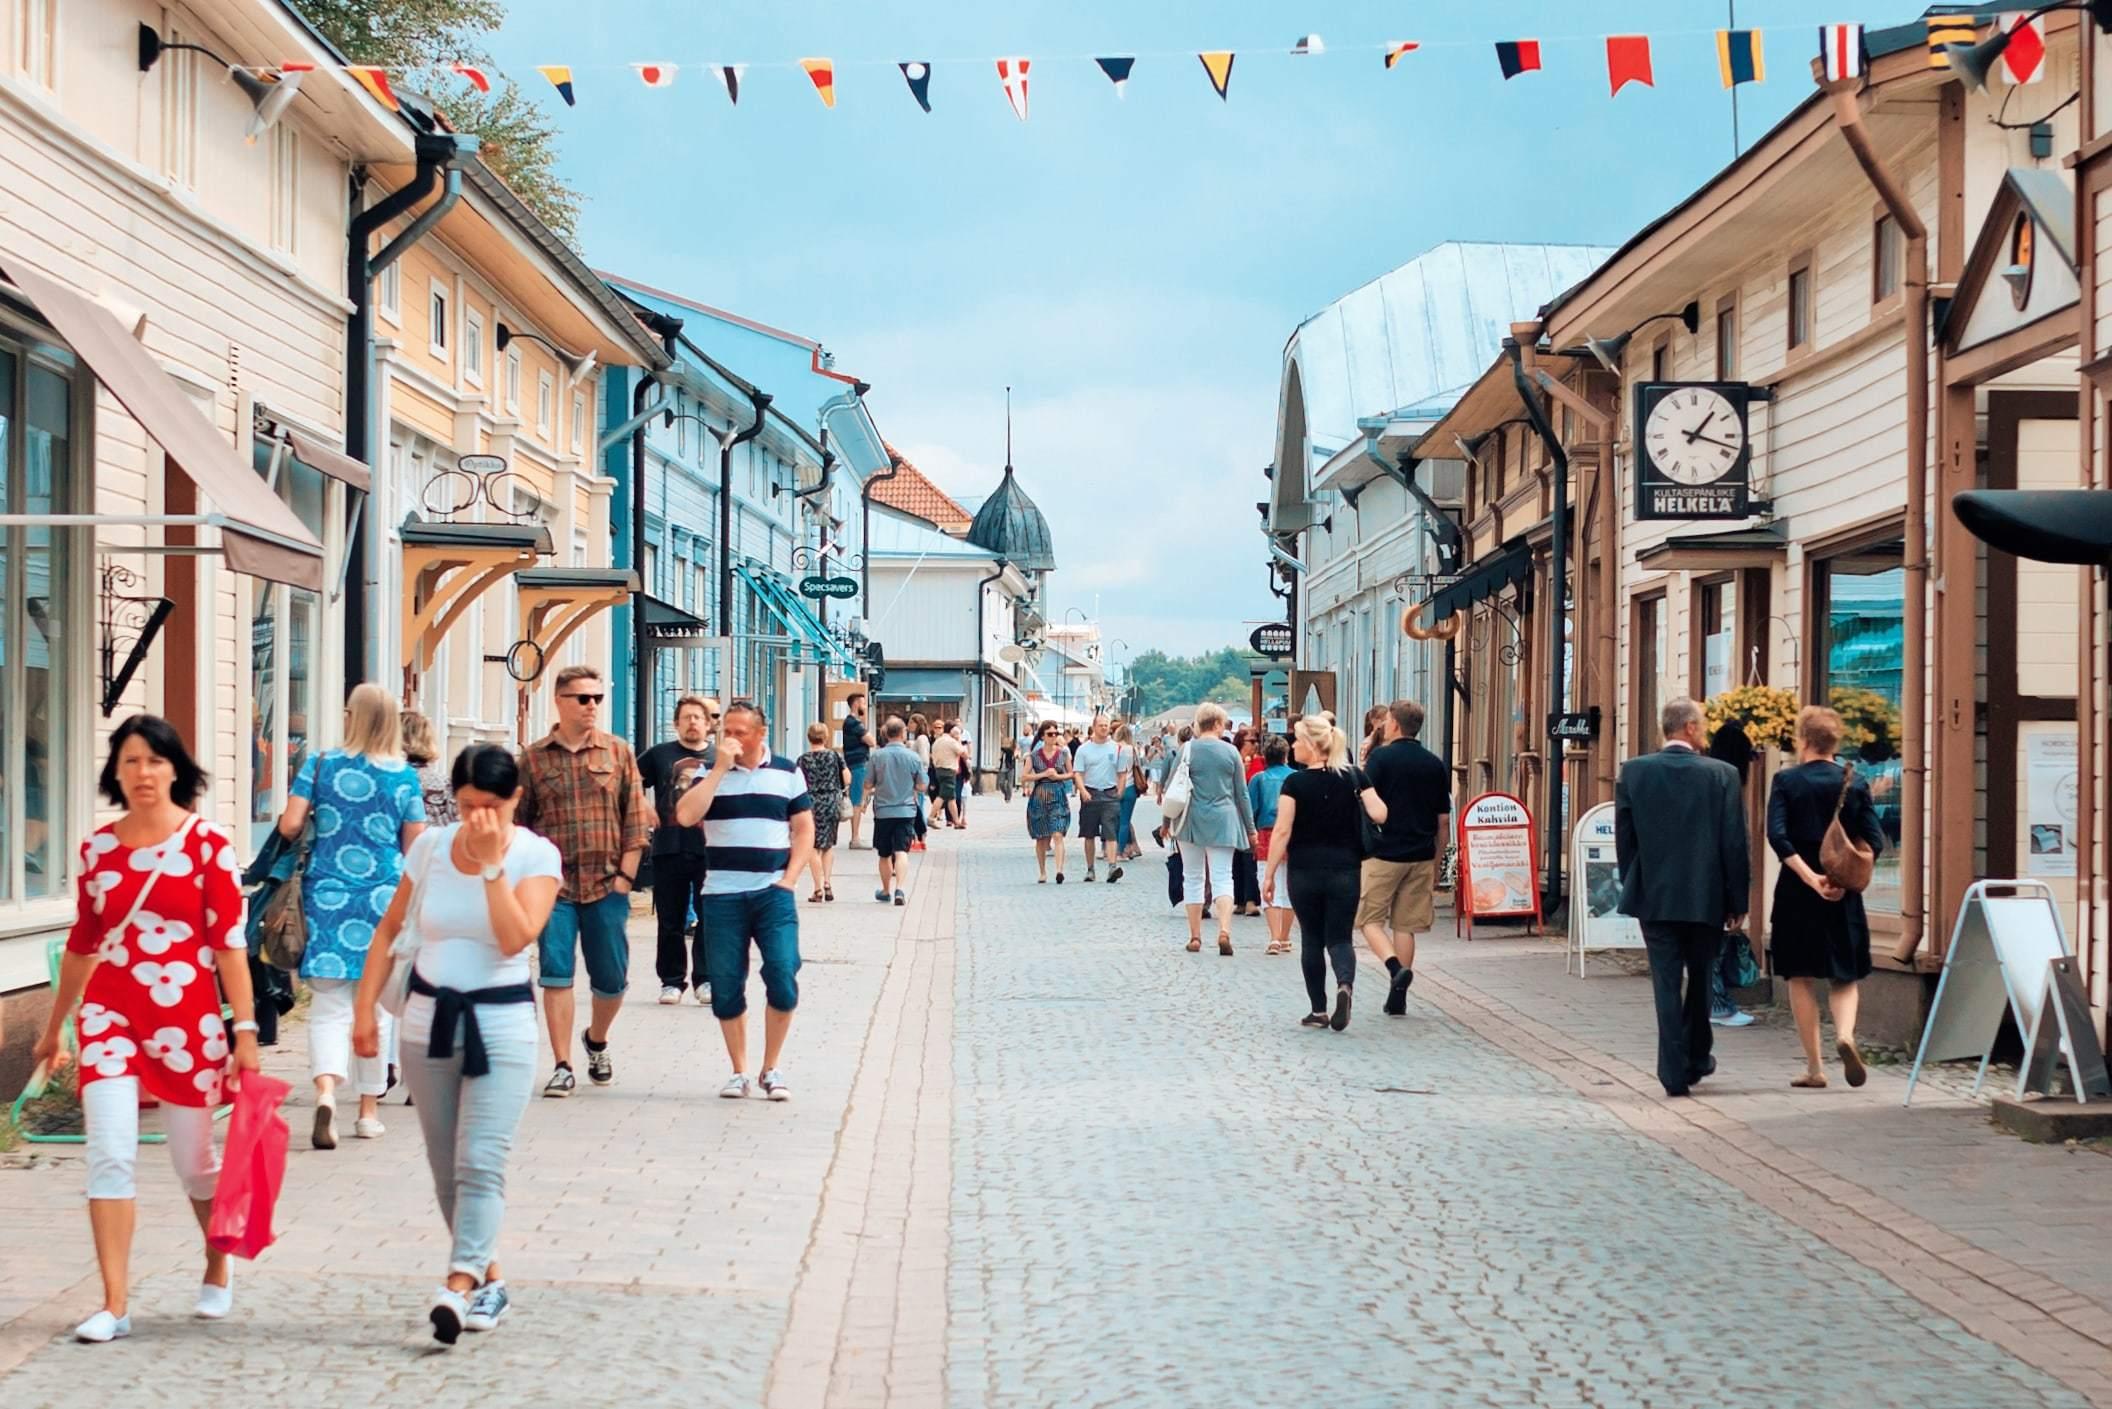 Vanha Rauma, Suomen kaunein ostoskeskus